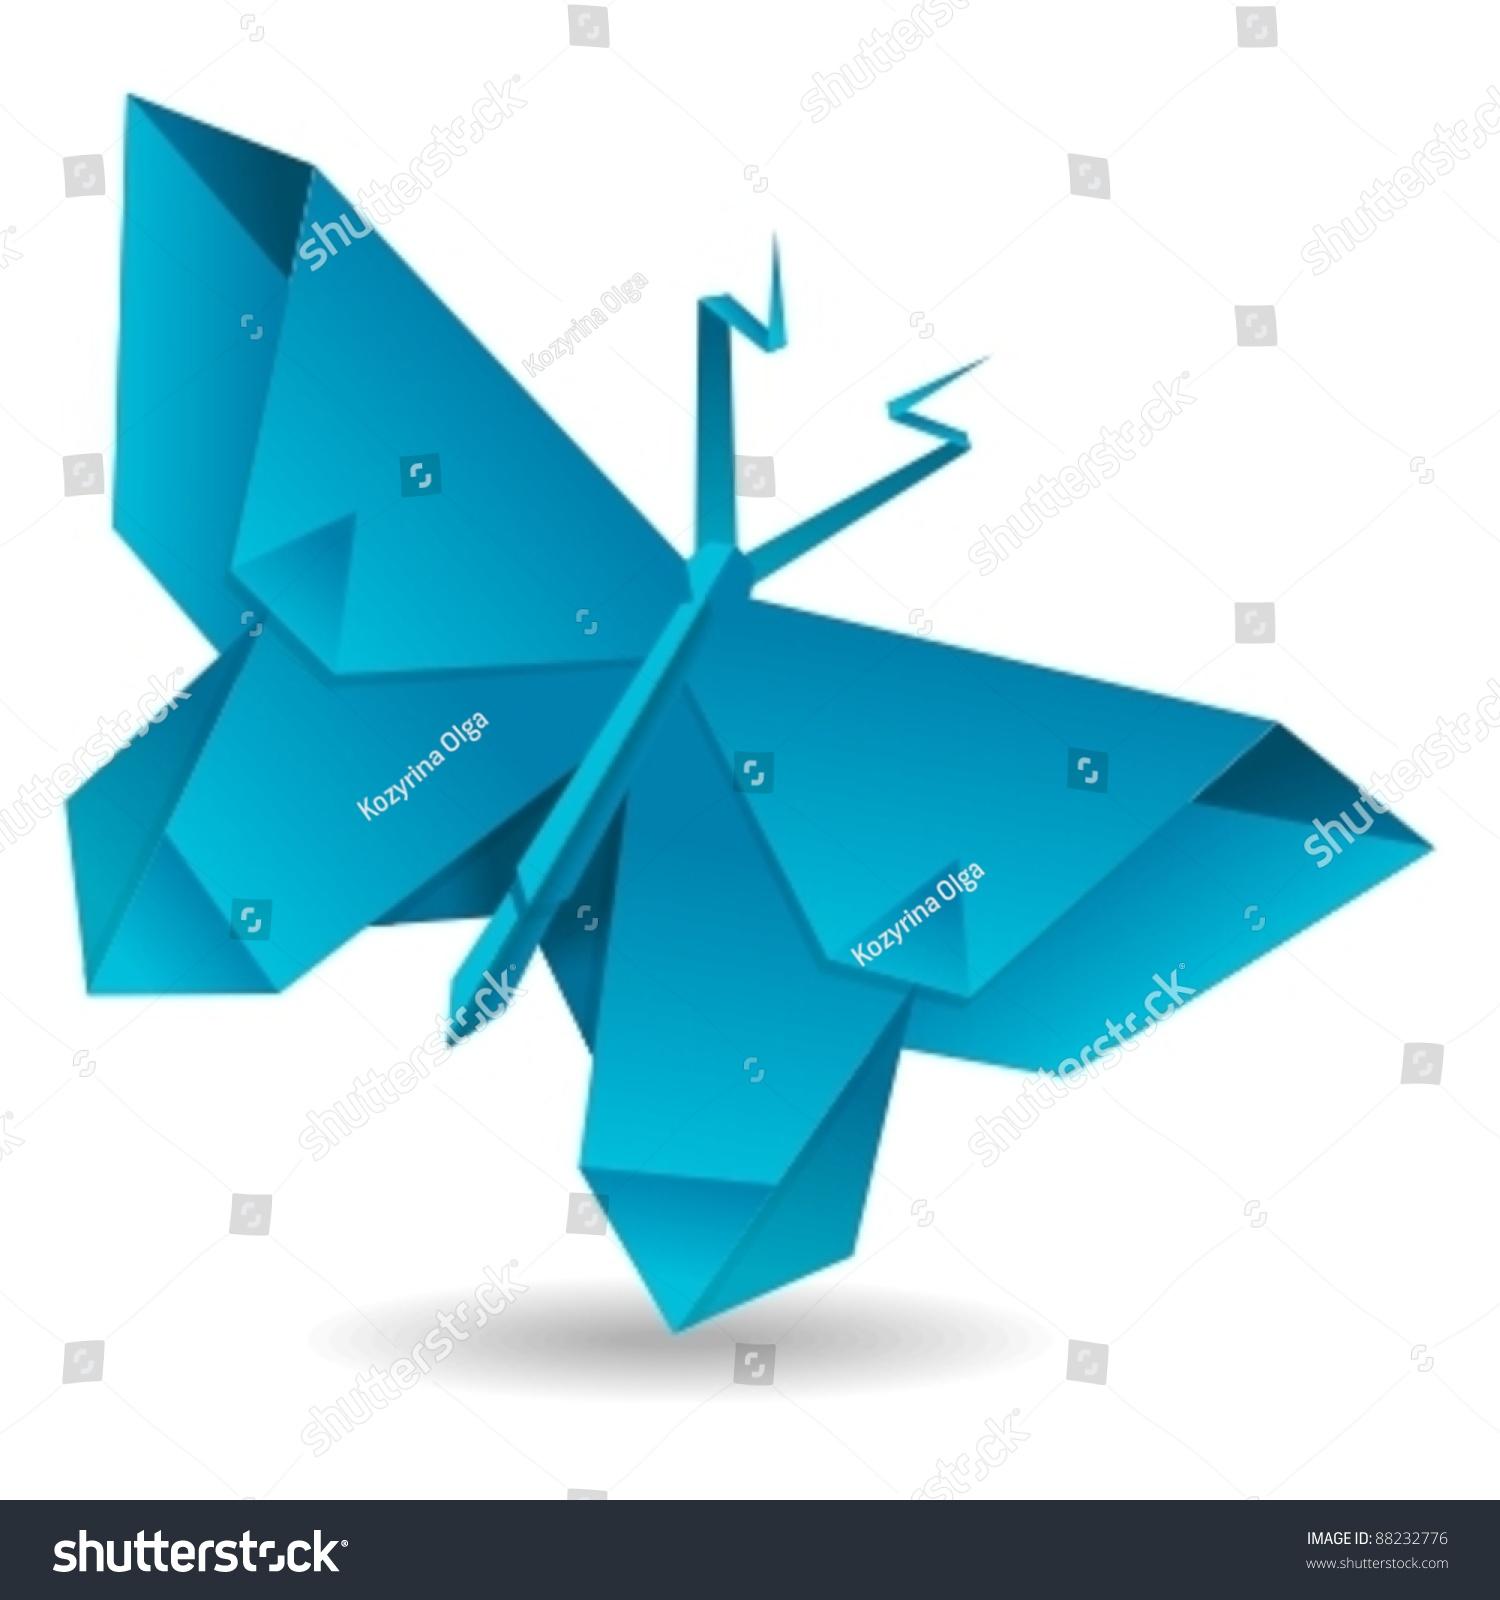 Vector Origami Butterfly Stock Vector 88232776 - Shutterstock - photo#22